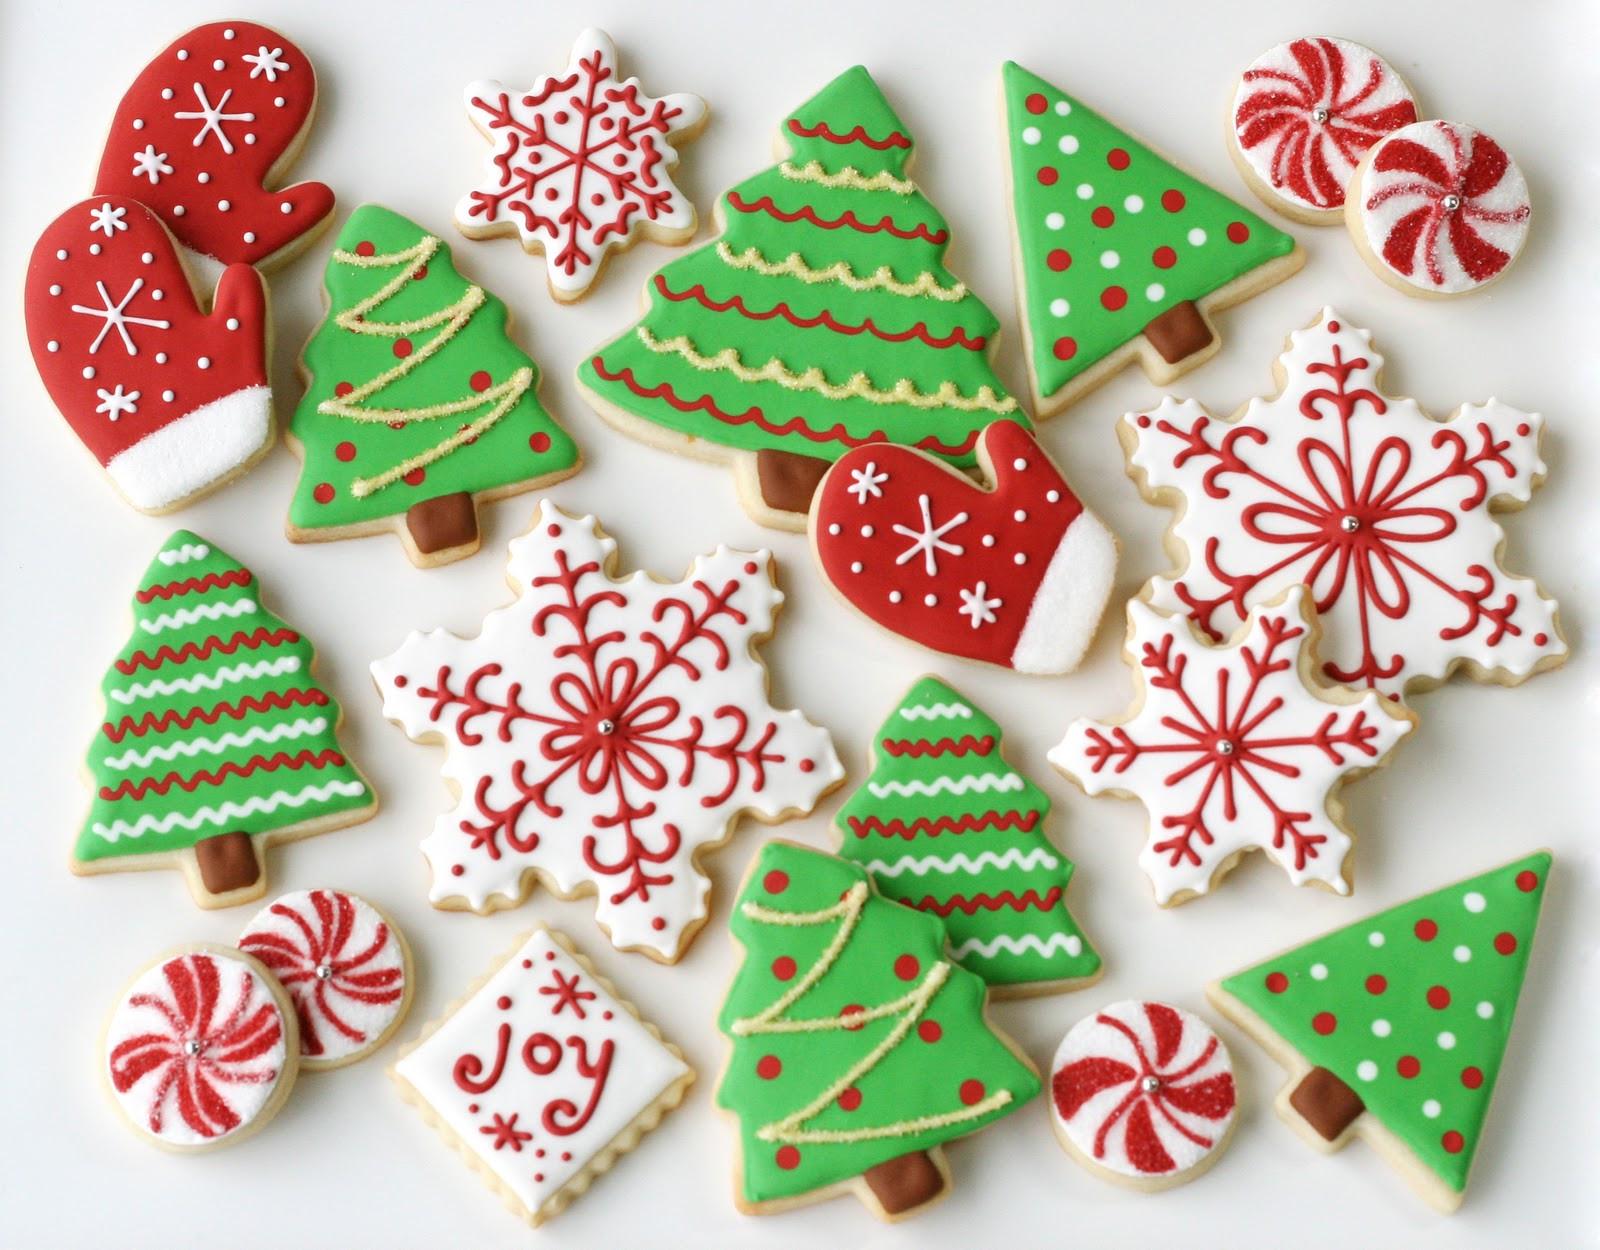 Cookies To Make For Christmas  Christmas Cookies Galore Glorious Treats